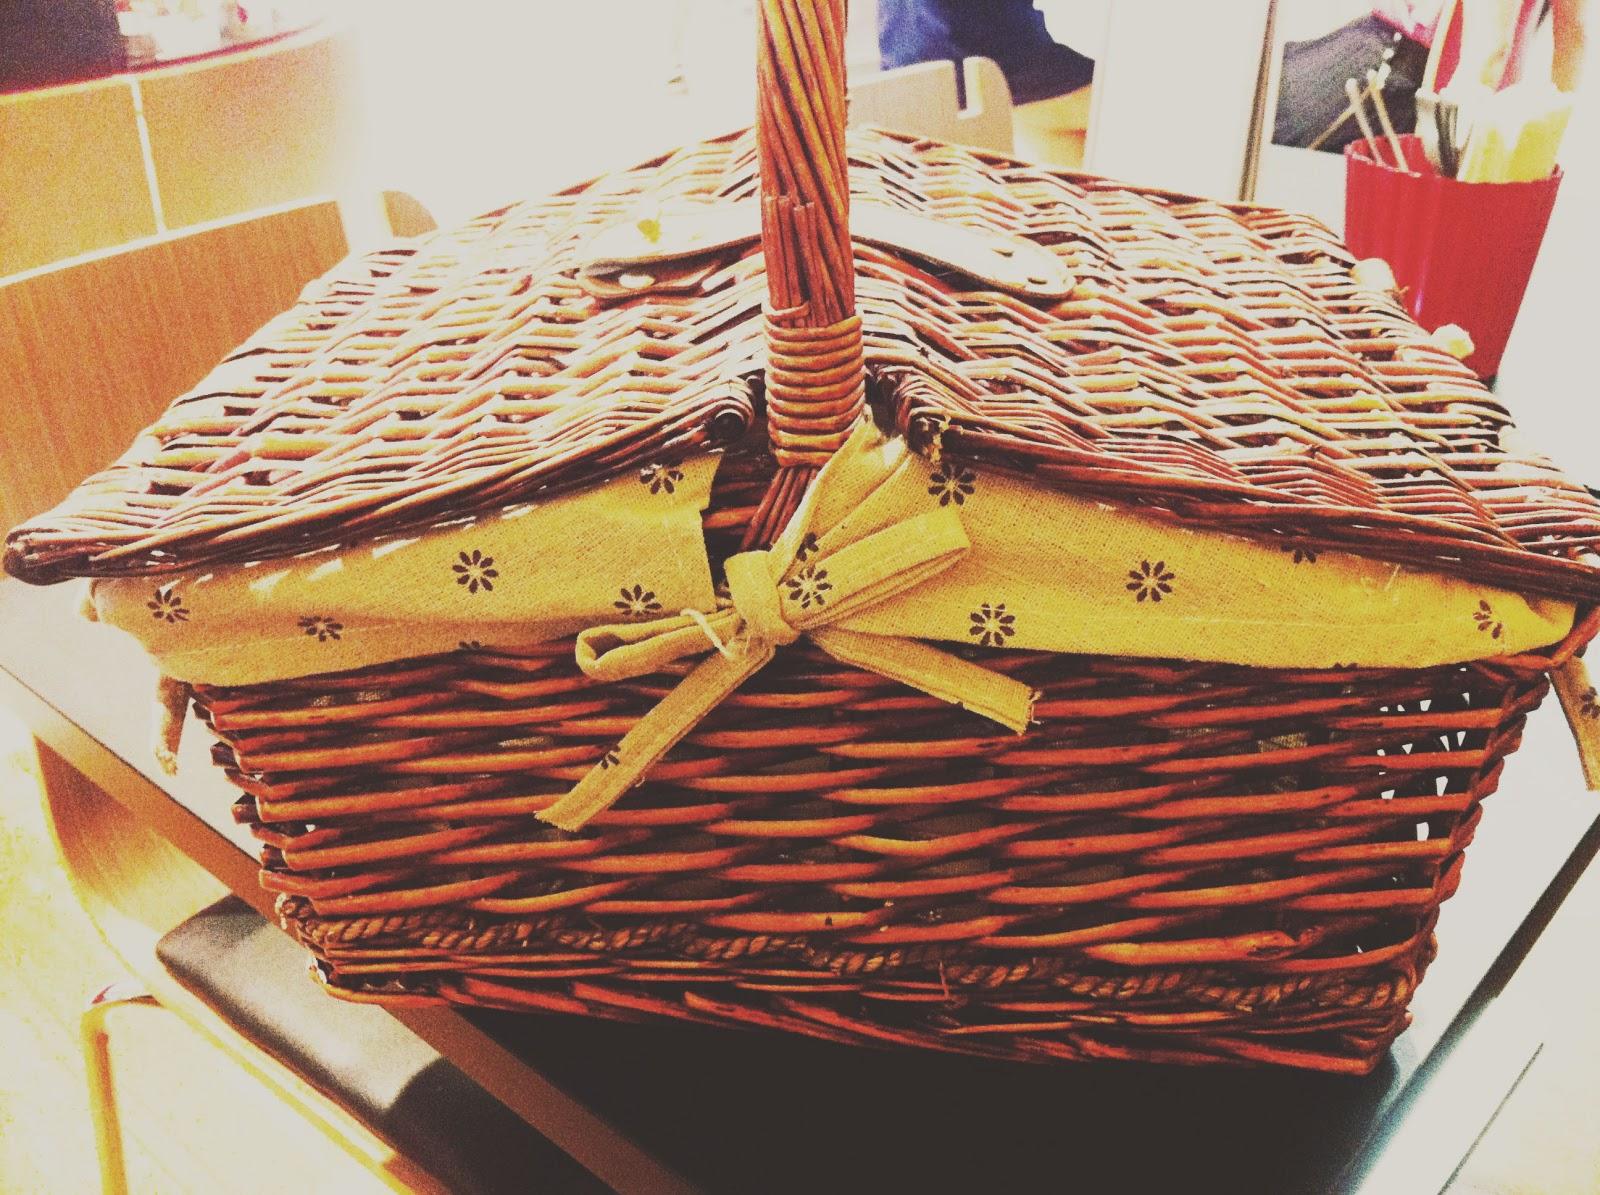 Picnic Basket Restaurant Happy Hollow : Shanice koh a singapore based on fashion lifestyle